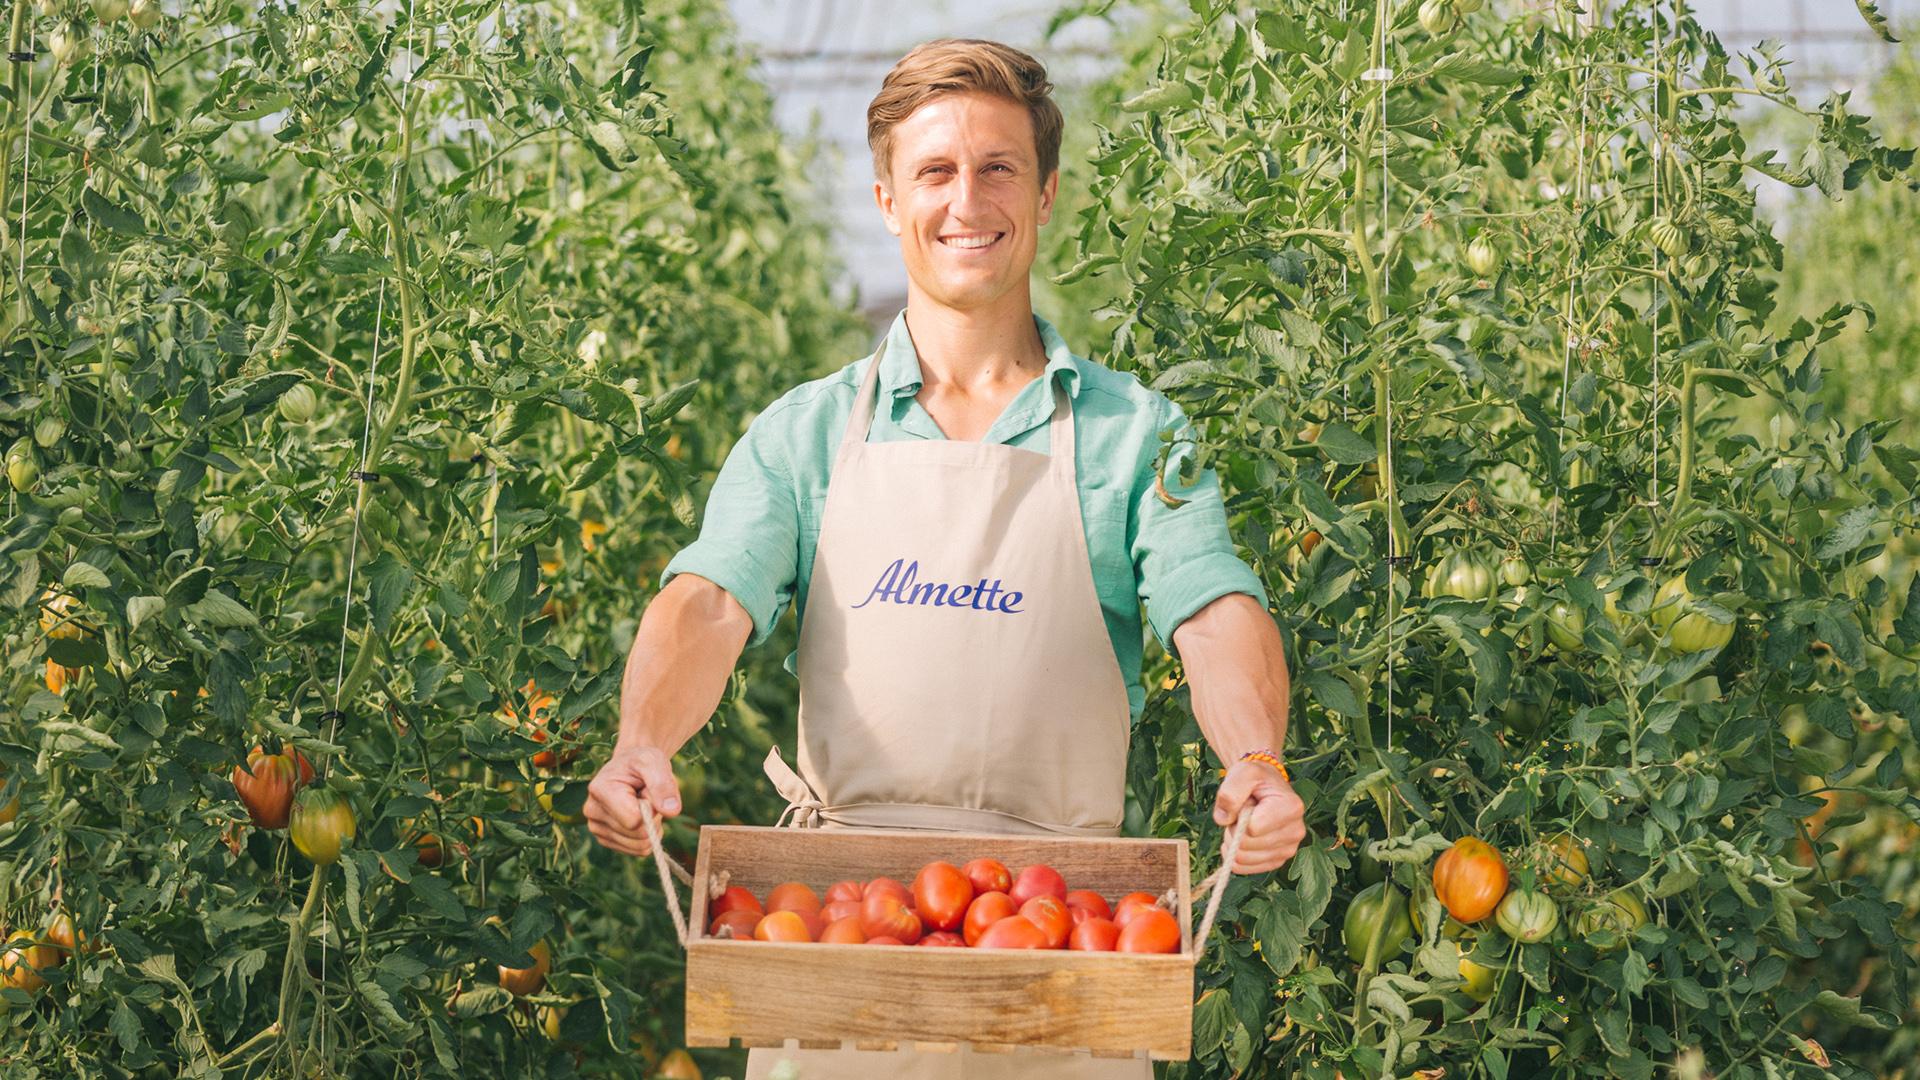 pomidory-galeria-045-hr